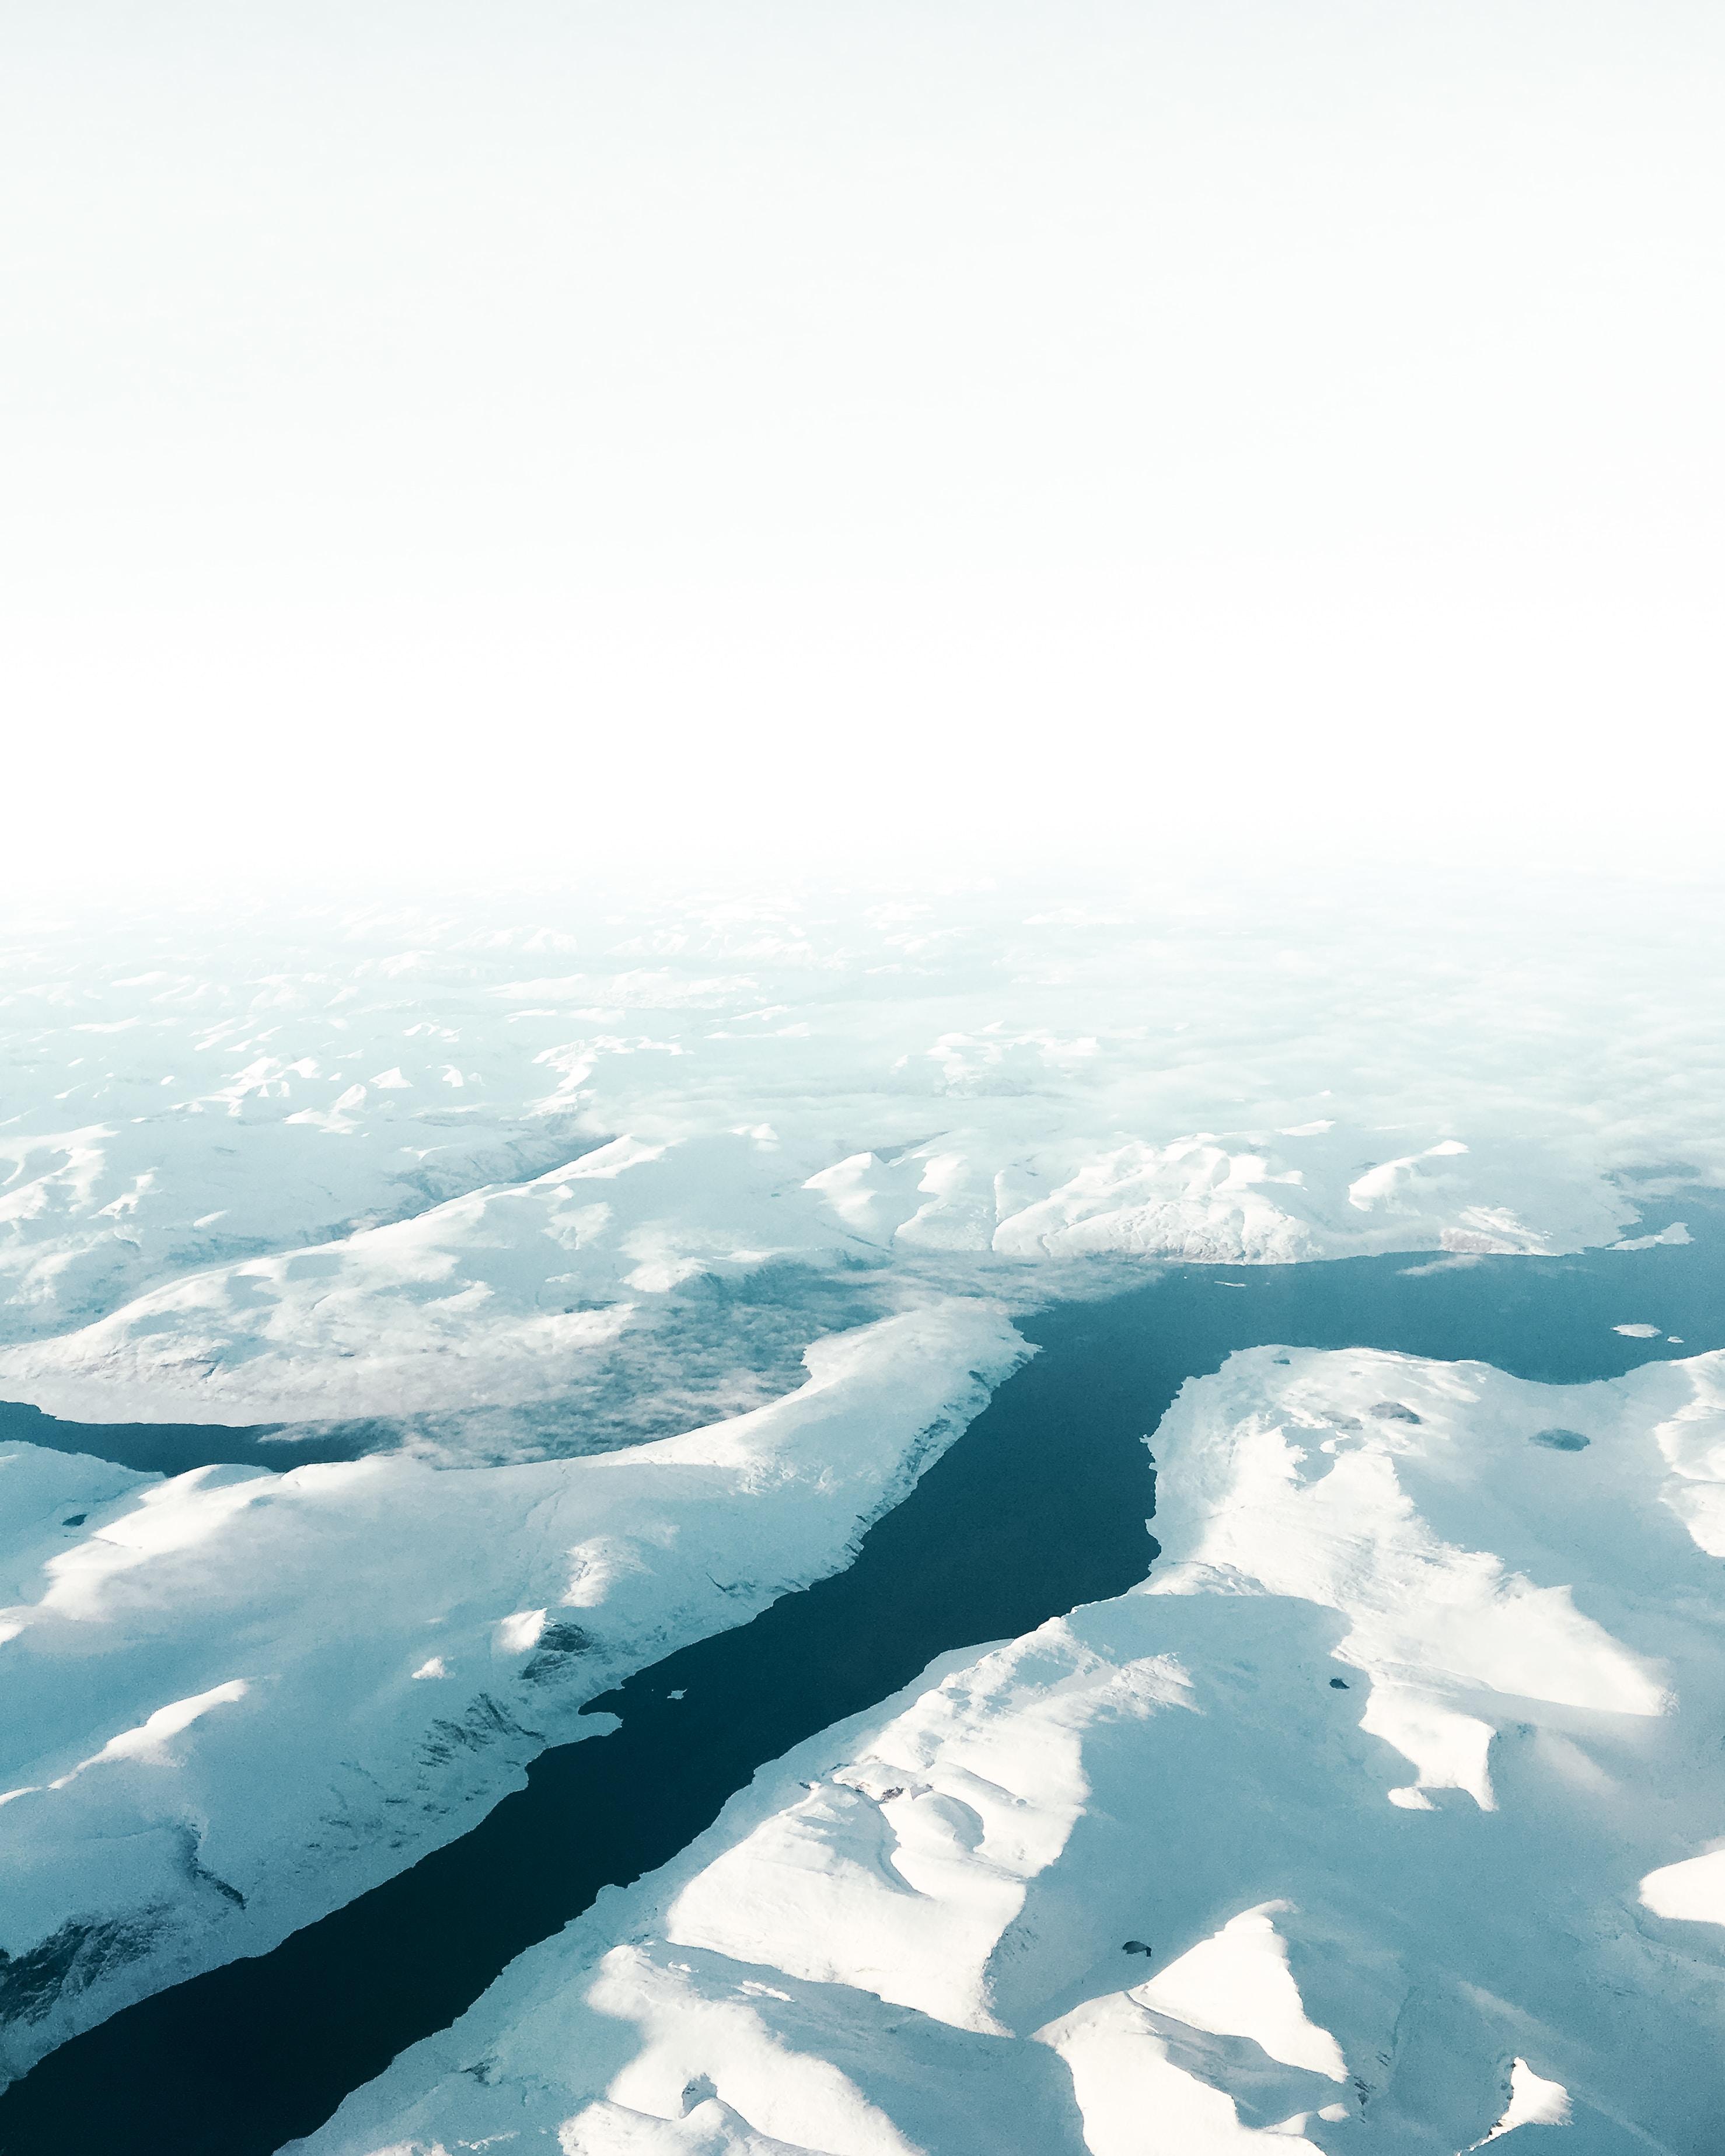 aerial photography of iceberg